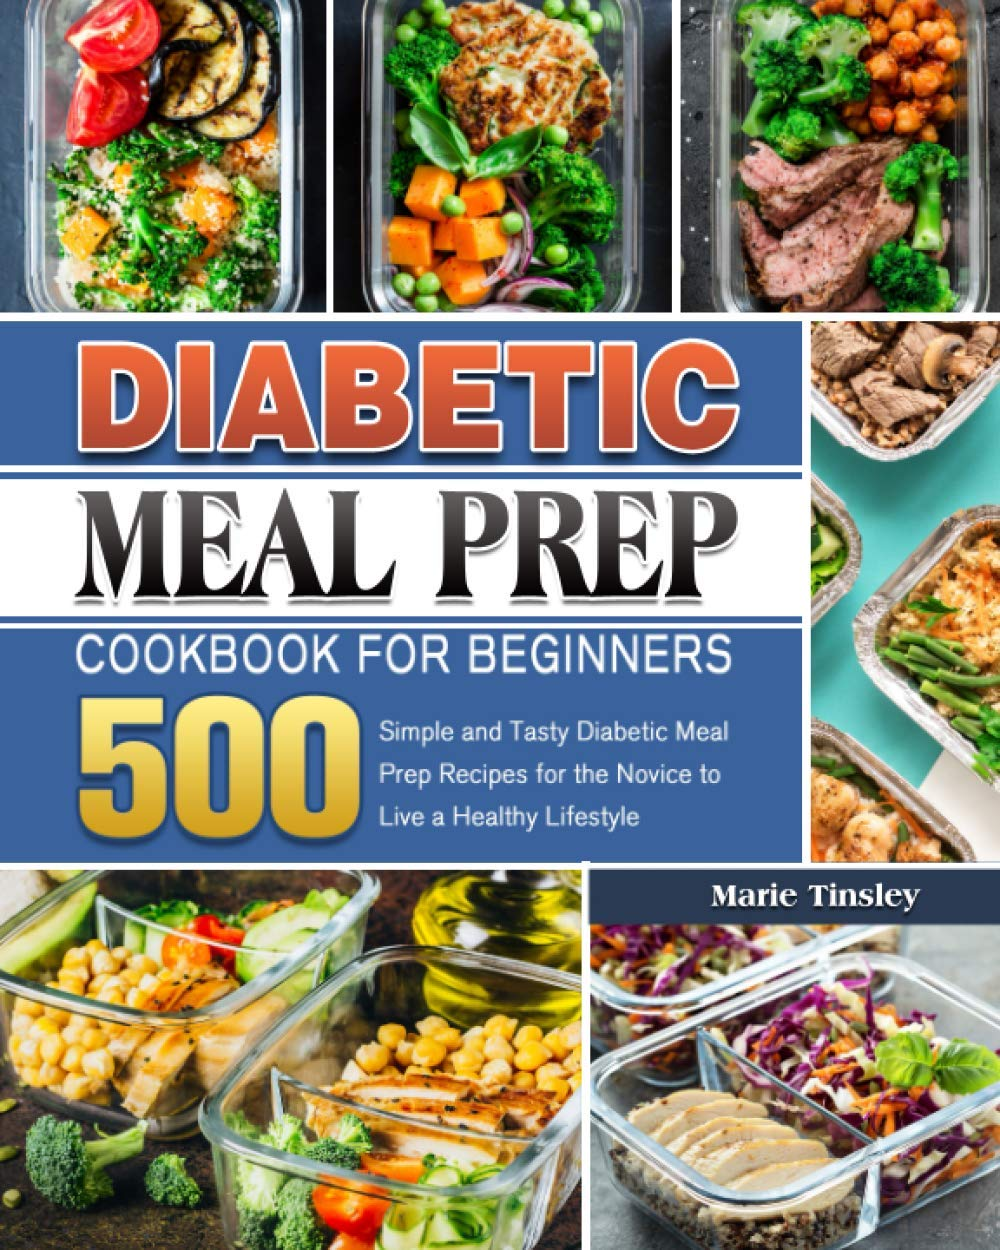 Top 10 Best meal prep for diabetics Reviews